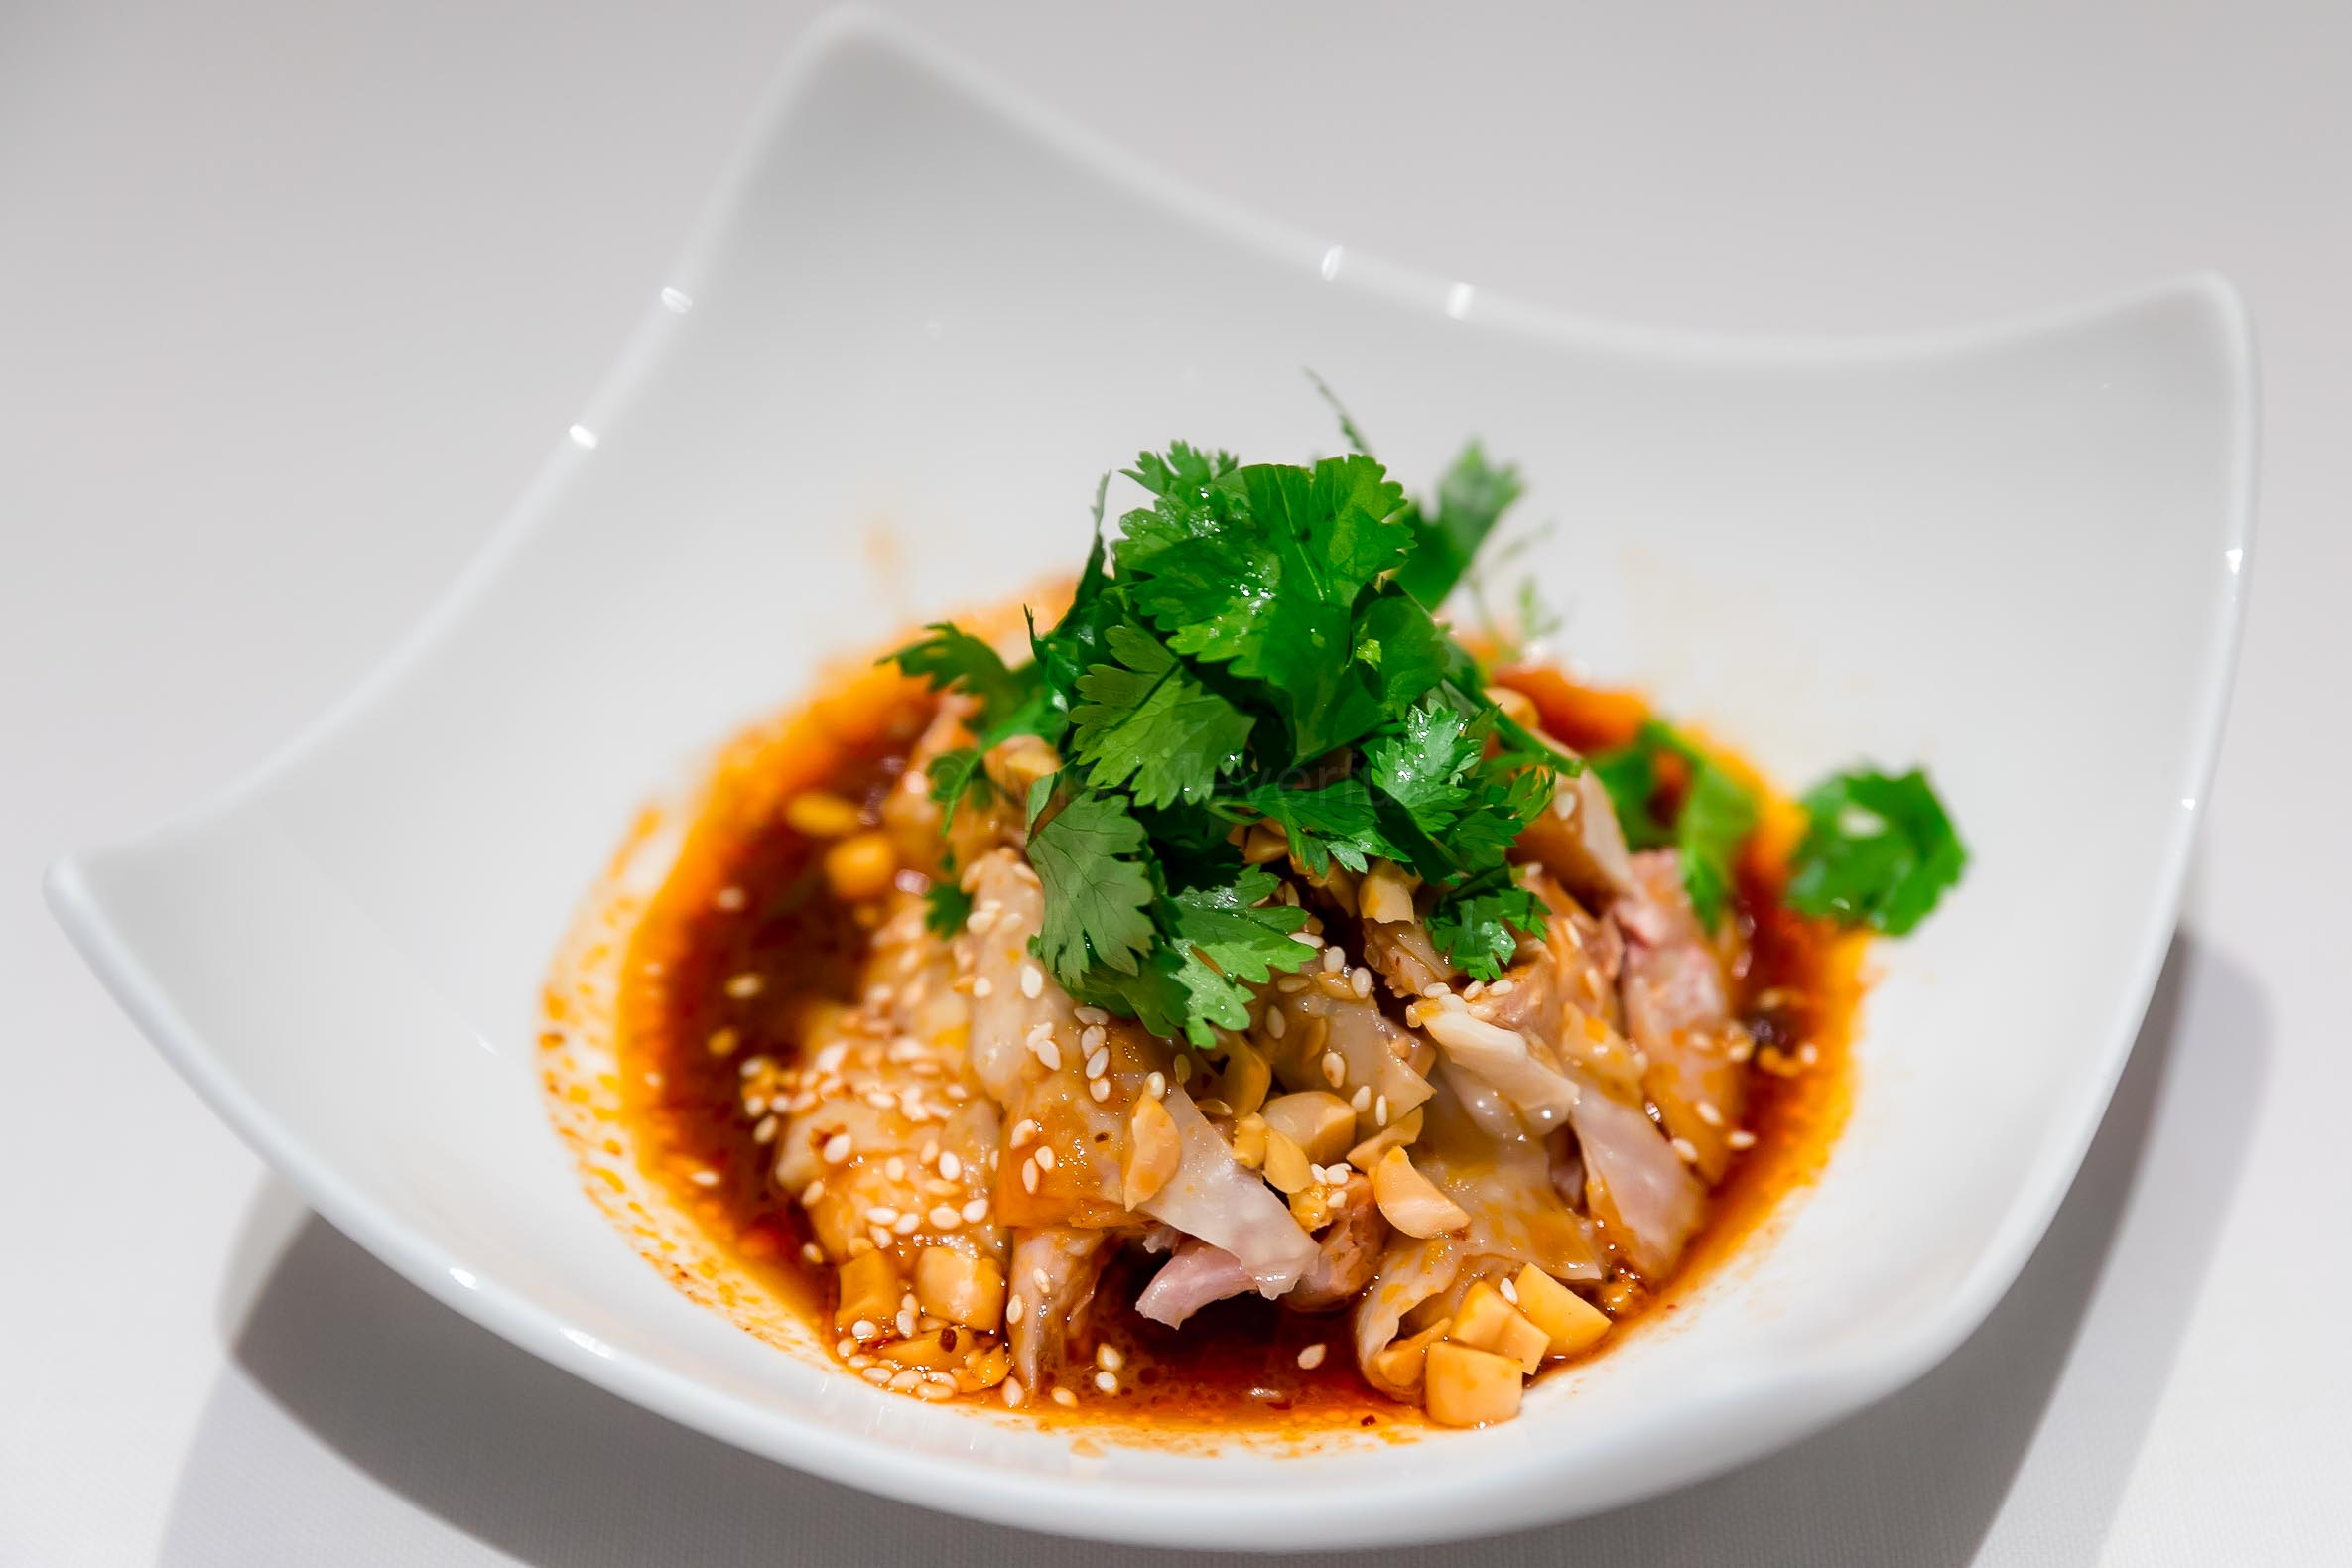 四川口水雞 Spicy Chicken Sichuan Style